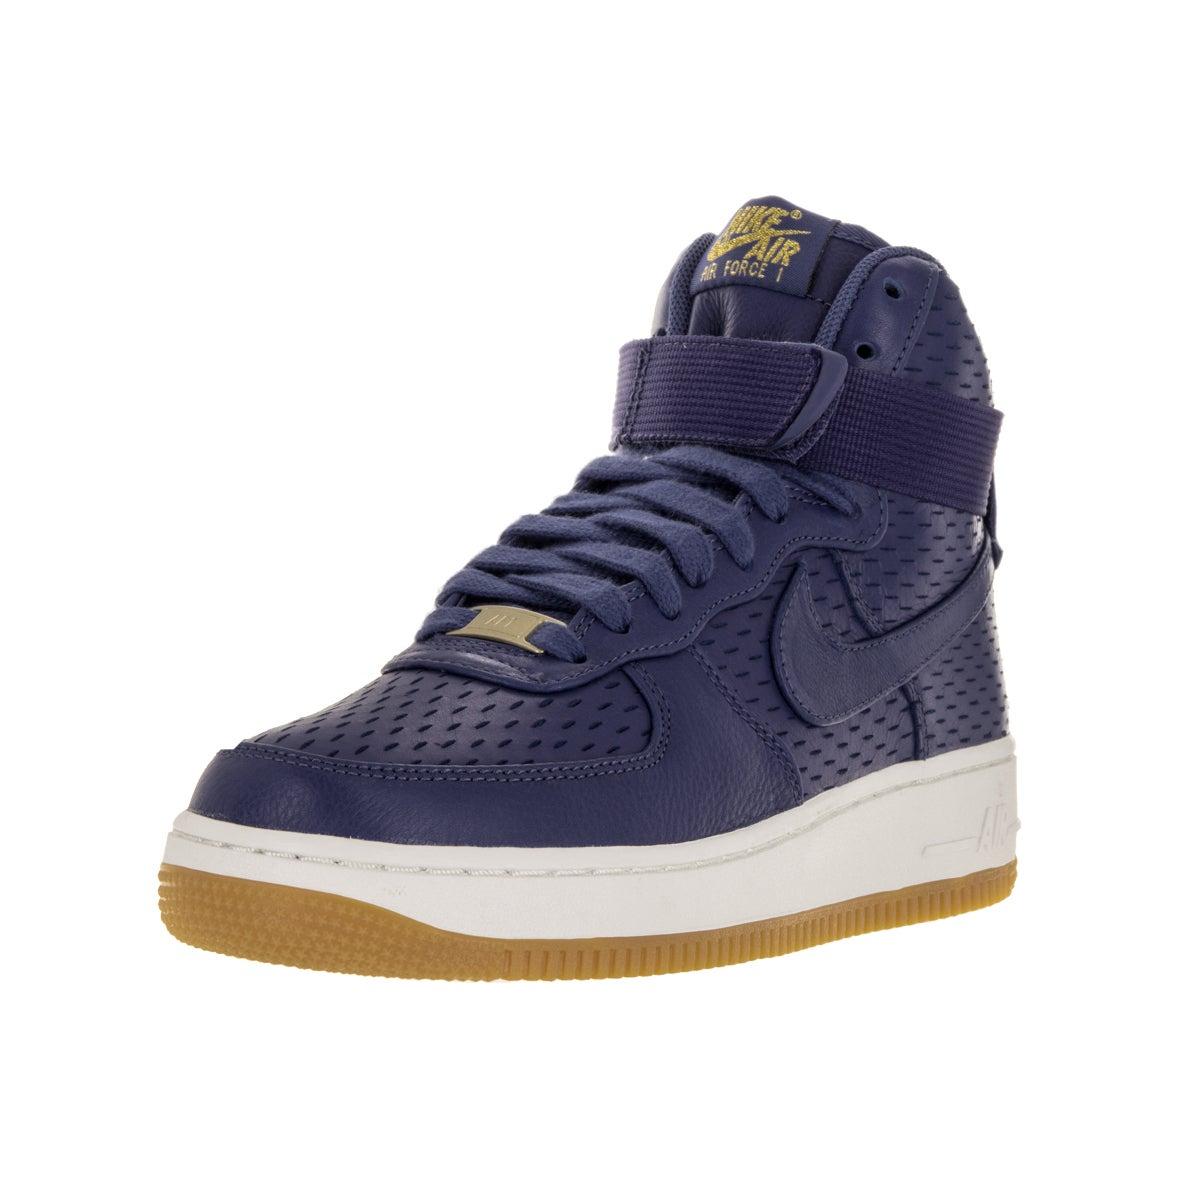 Nike Women's Air Force 1 Hi Purple Leather Premium Basket...